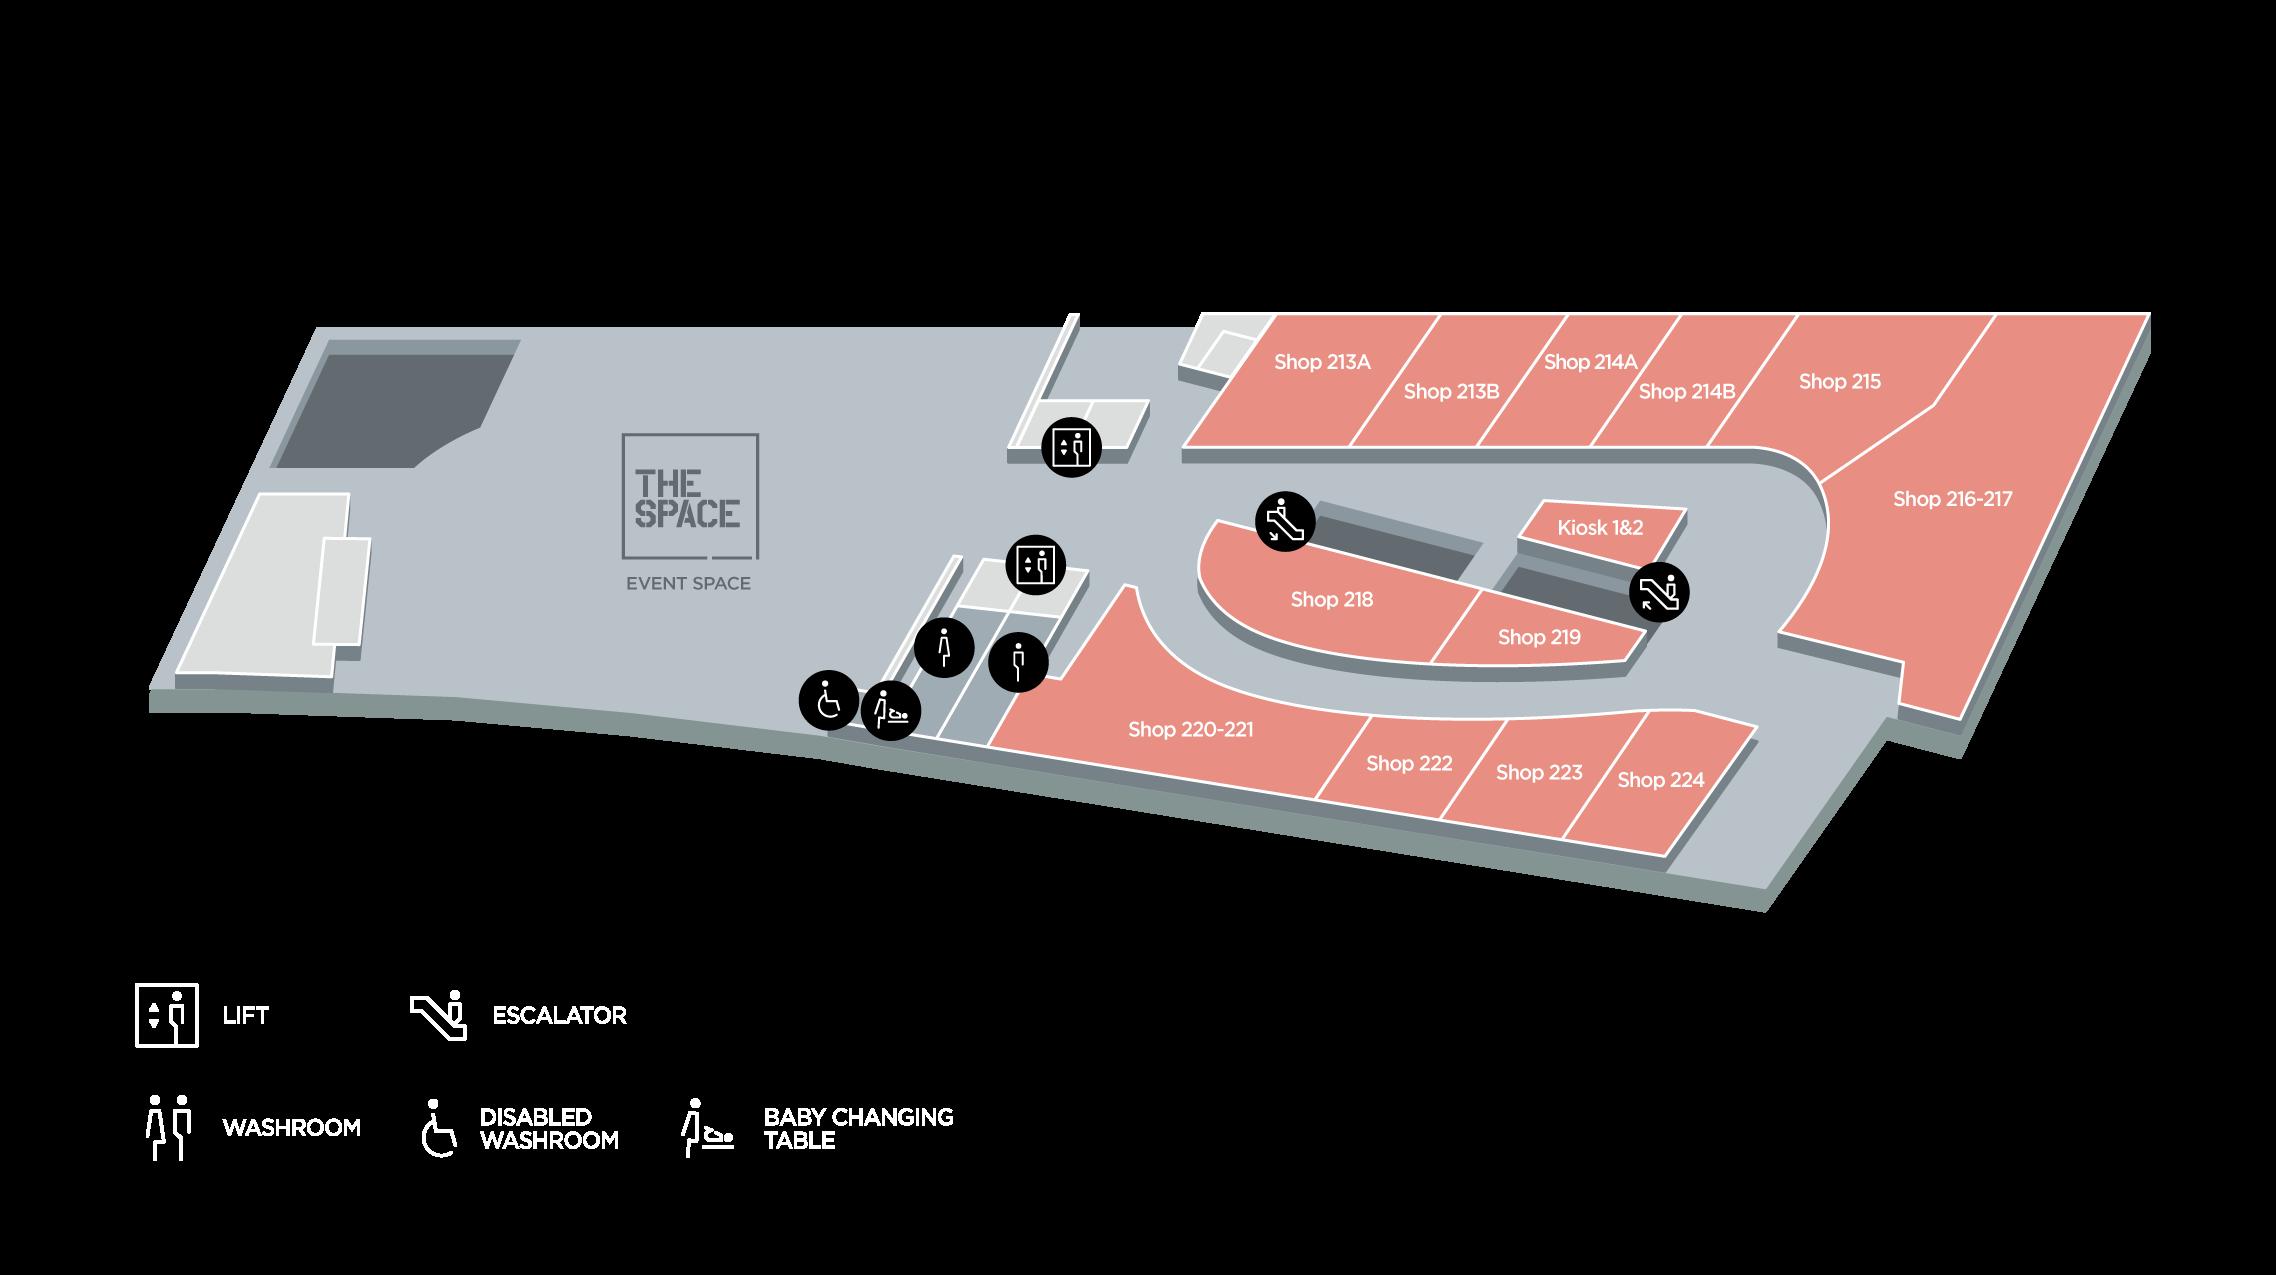 20180222_D2P_Directory_Floorplan_v1c.png